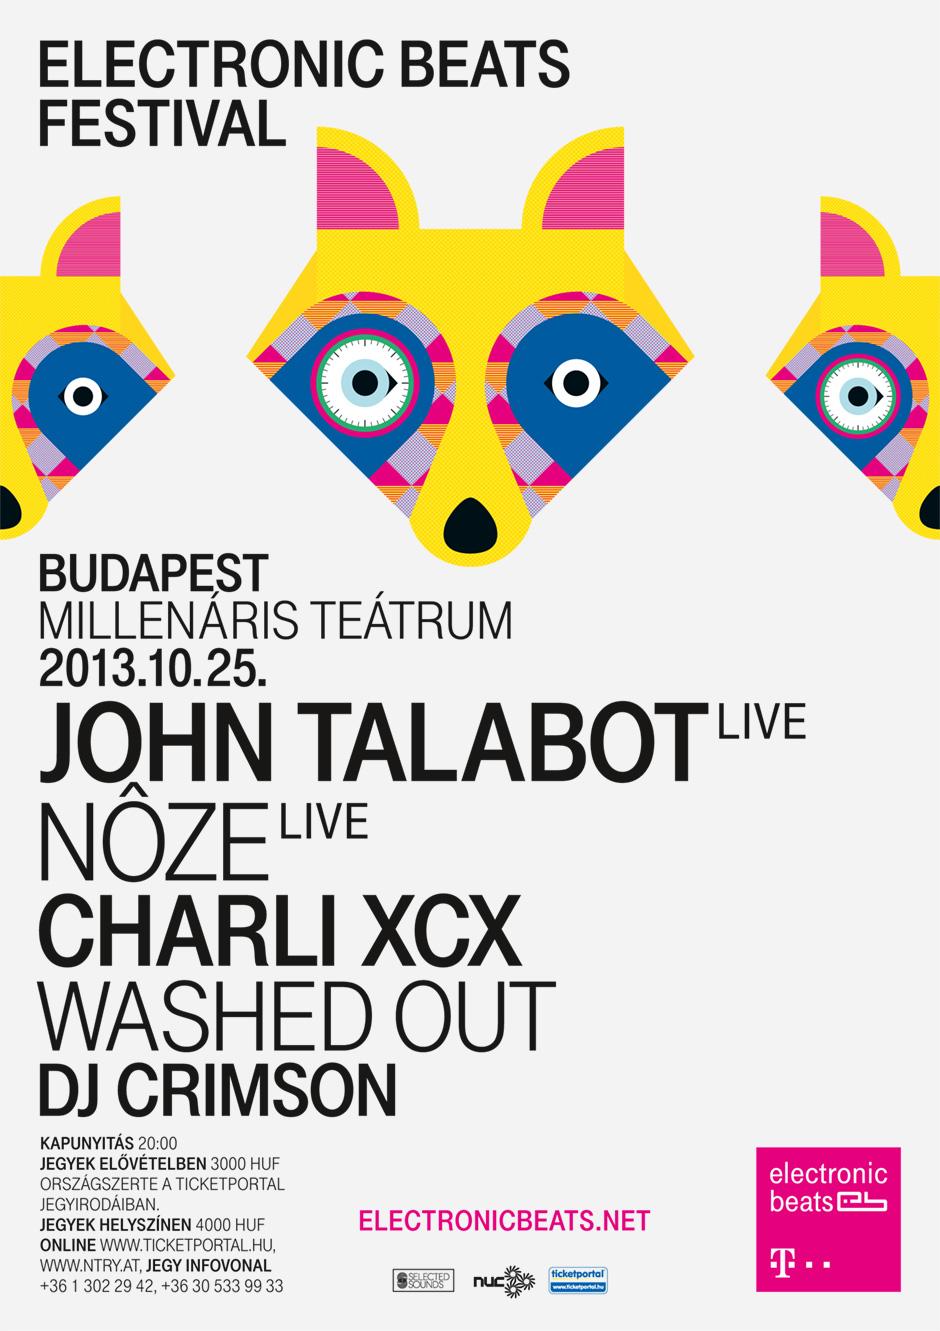 Festival_Budapest_Electronic_Beats_940